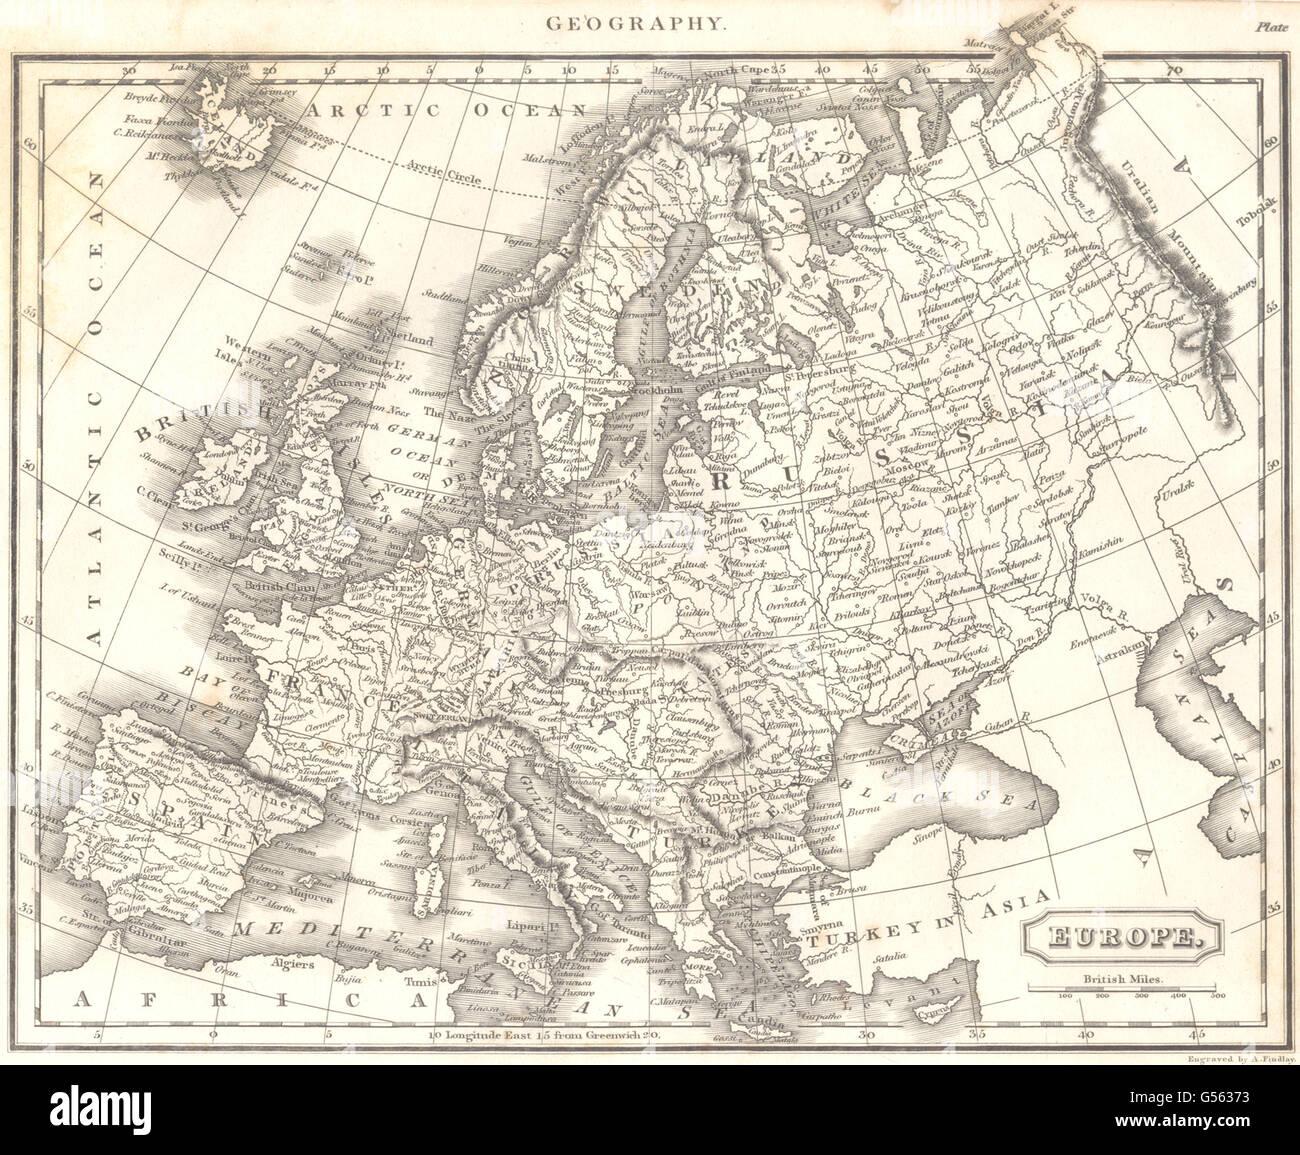 Europe Showing Austrian States Prussia Russia Etc 1830 Antique